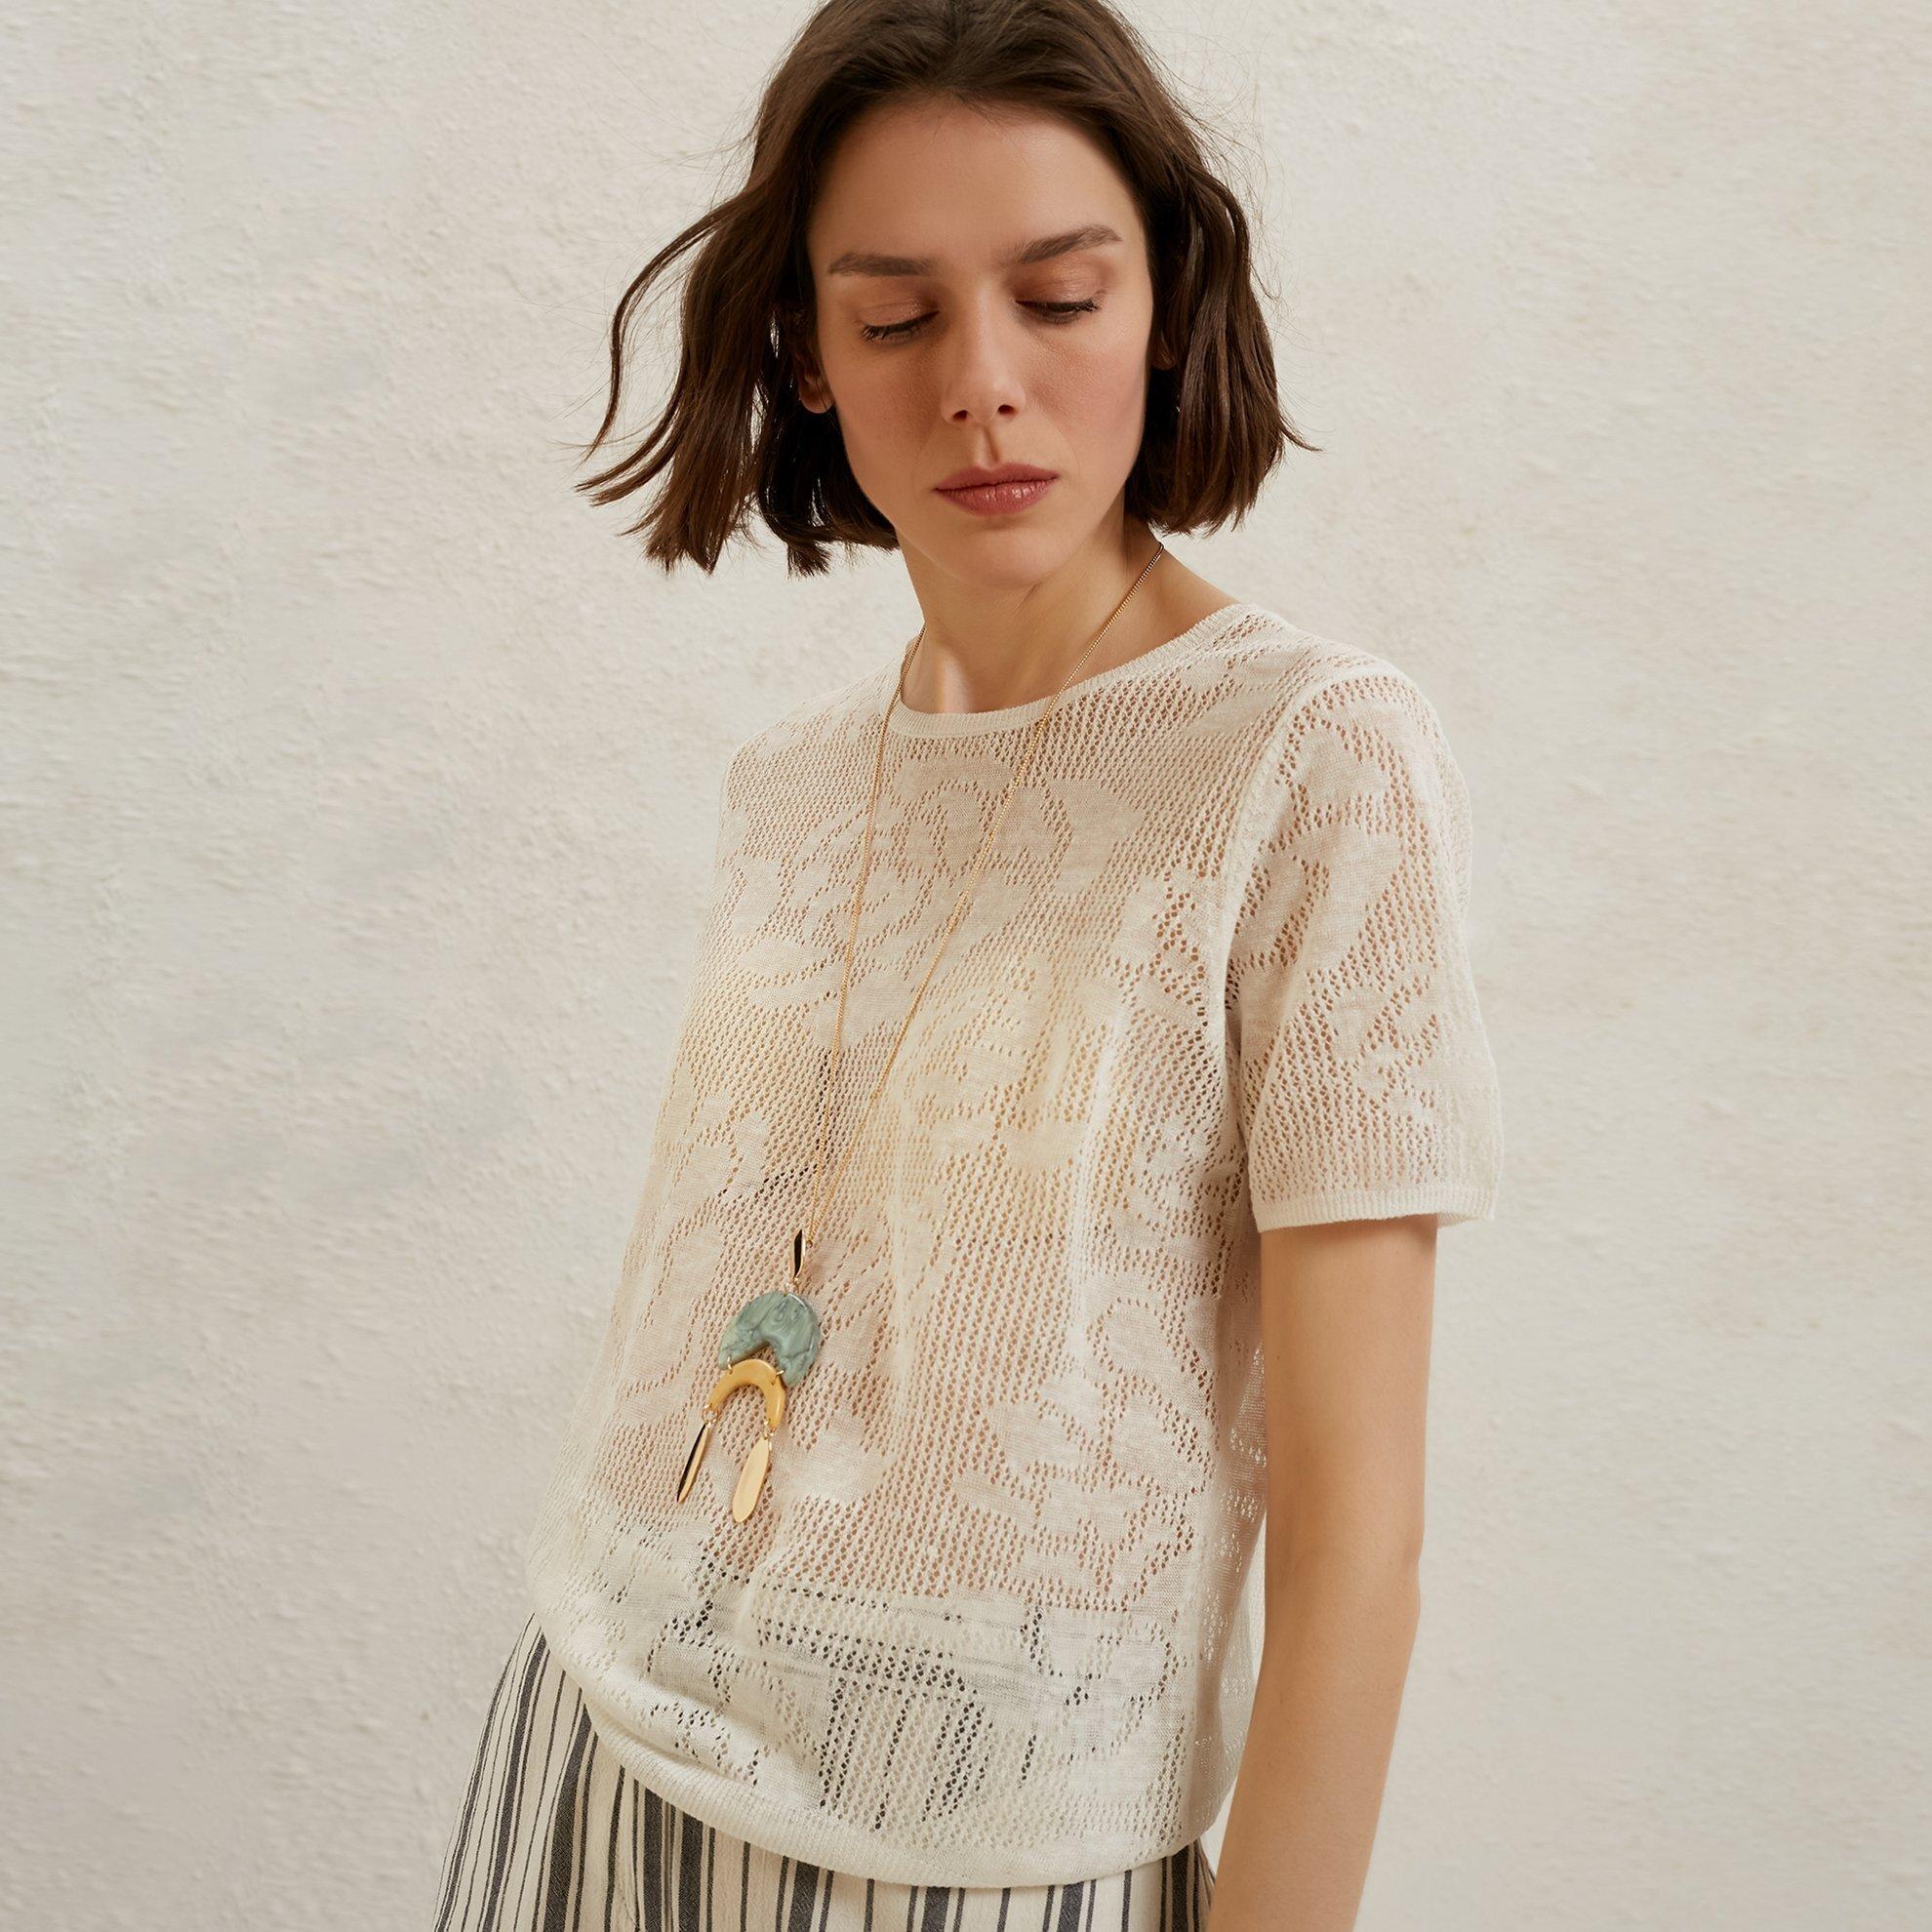 Jacquared Light Knitwear